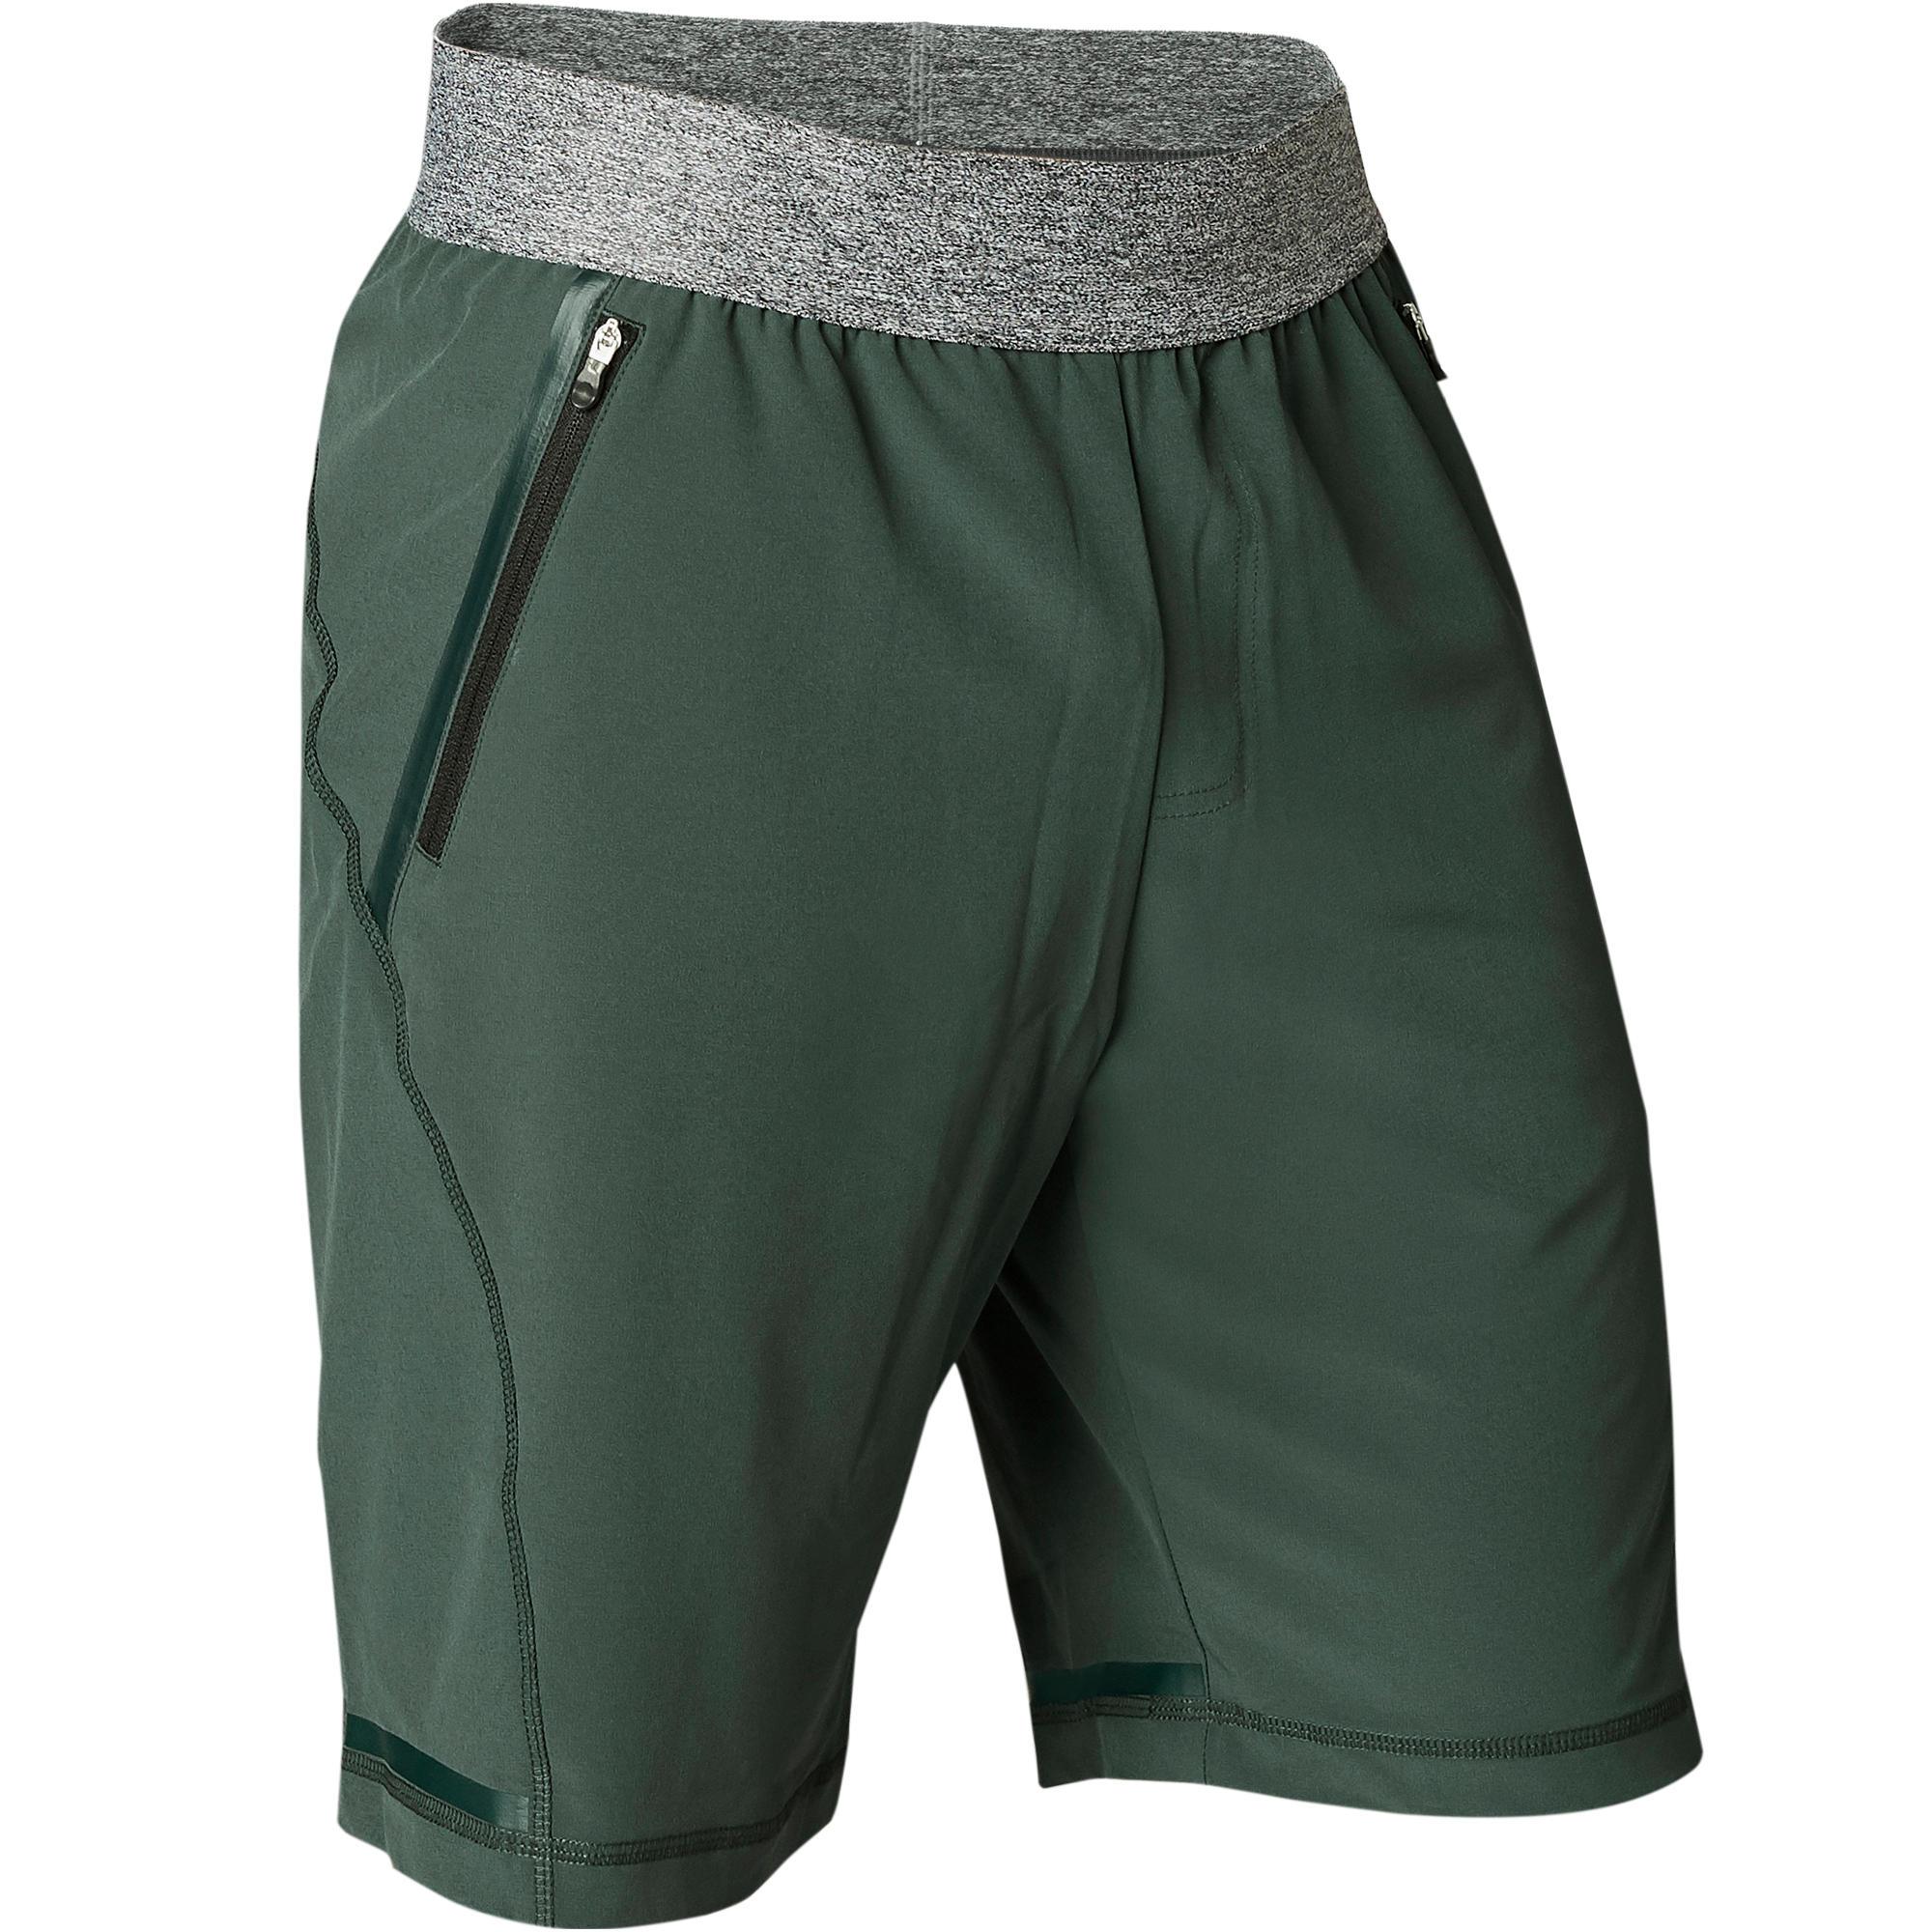 Woven Dynamic Yoga Shorts - Green